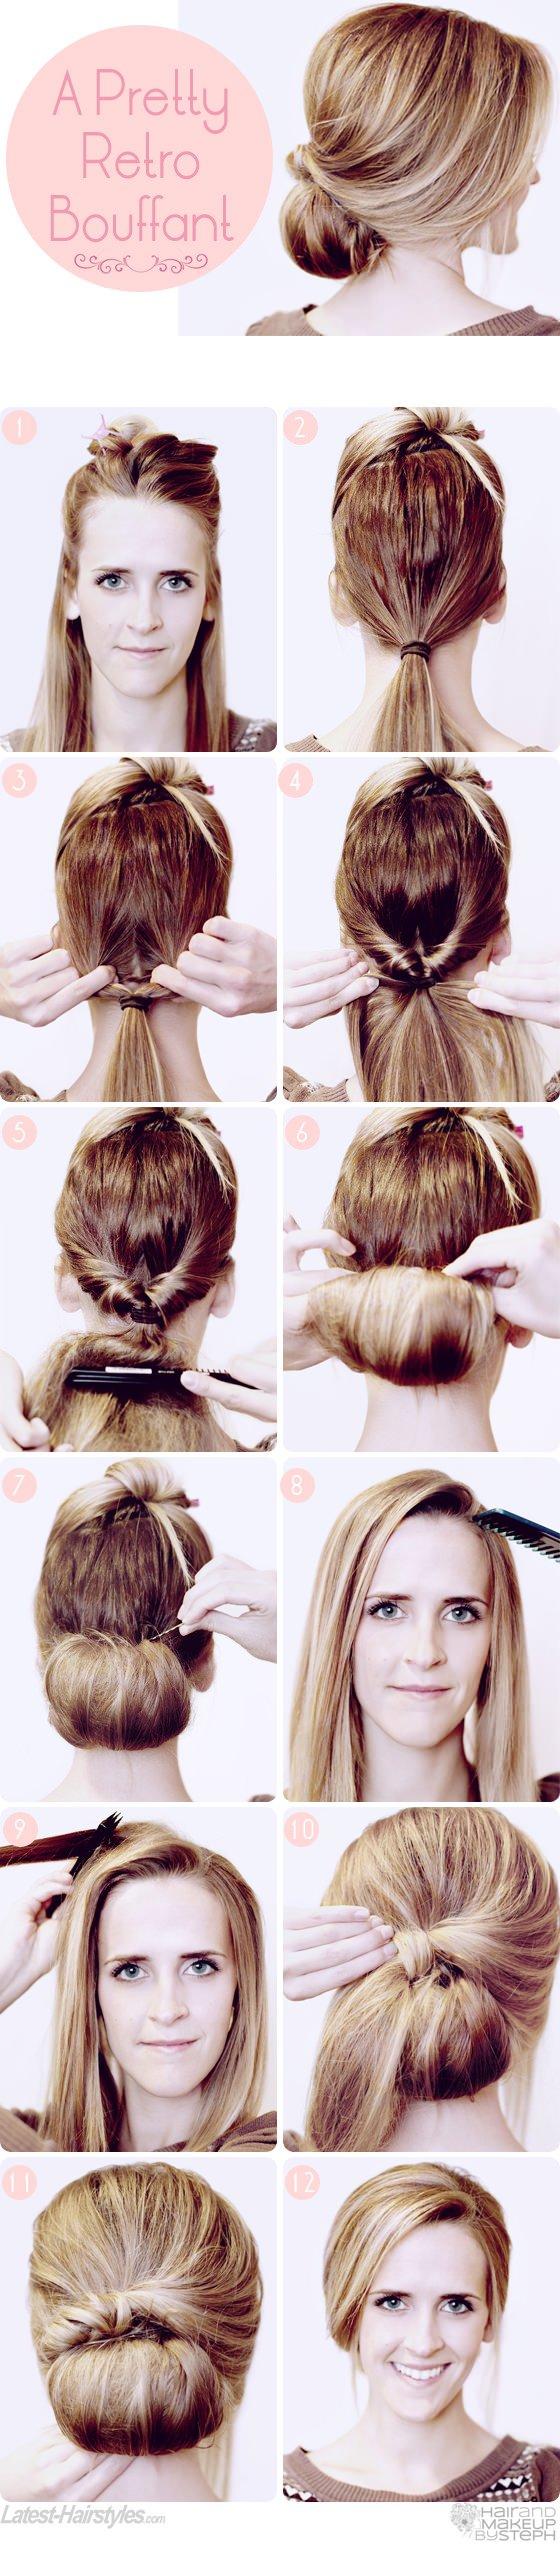 retro bouffant hair tutorial